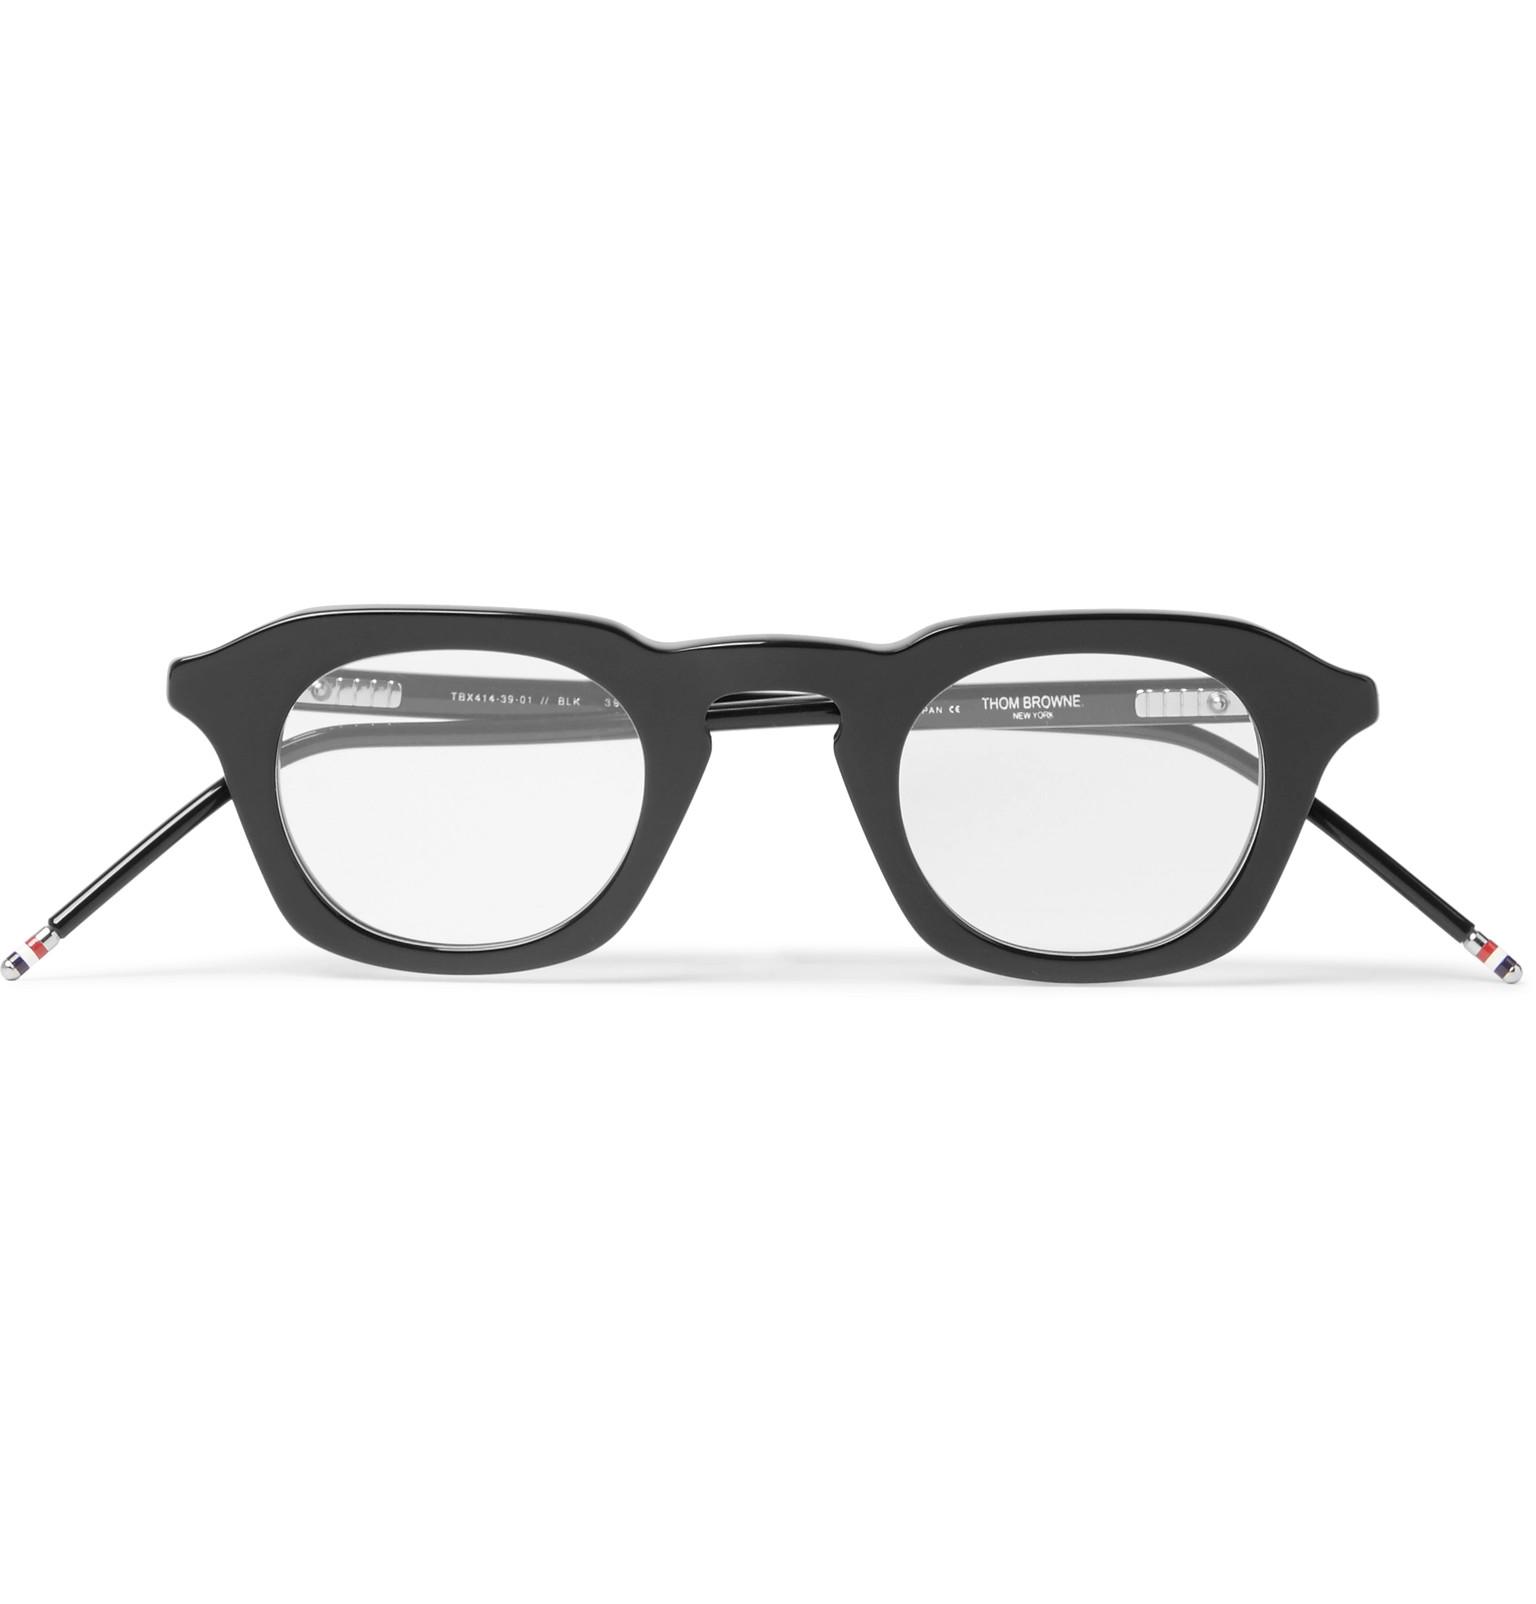 Thom Browne - 414 D-Frame Acetate Optical Glasses